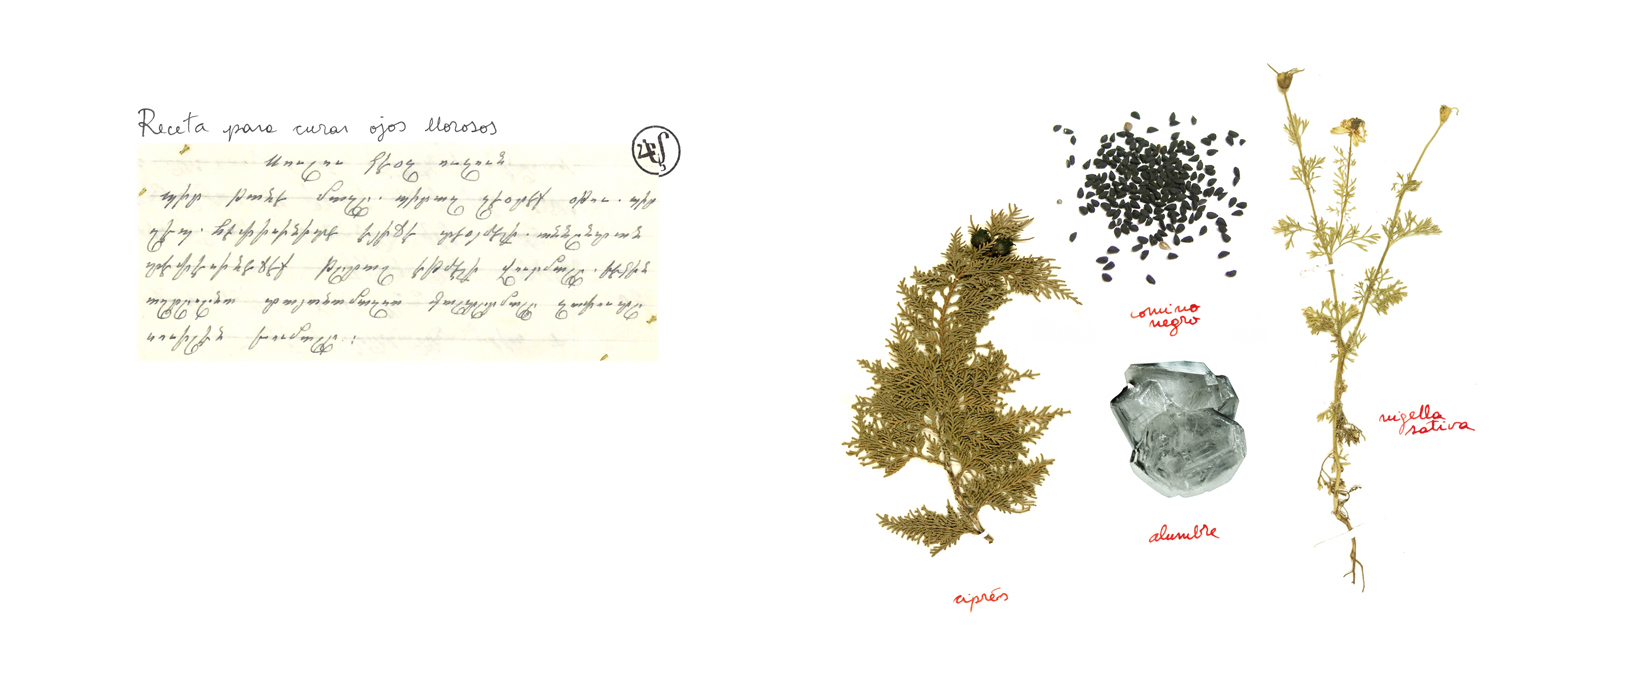 Silvina Der-Meguerditchian, Treasures, page 10, 2014